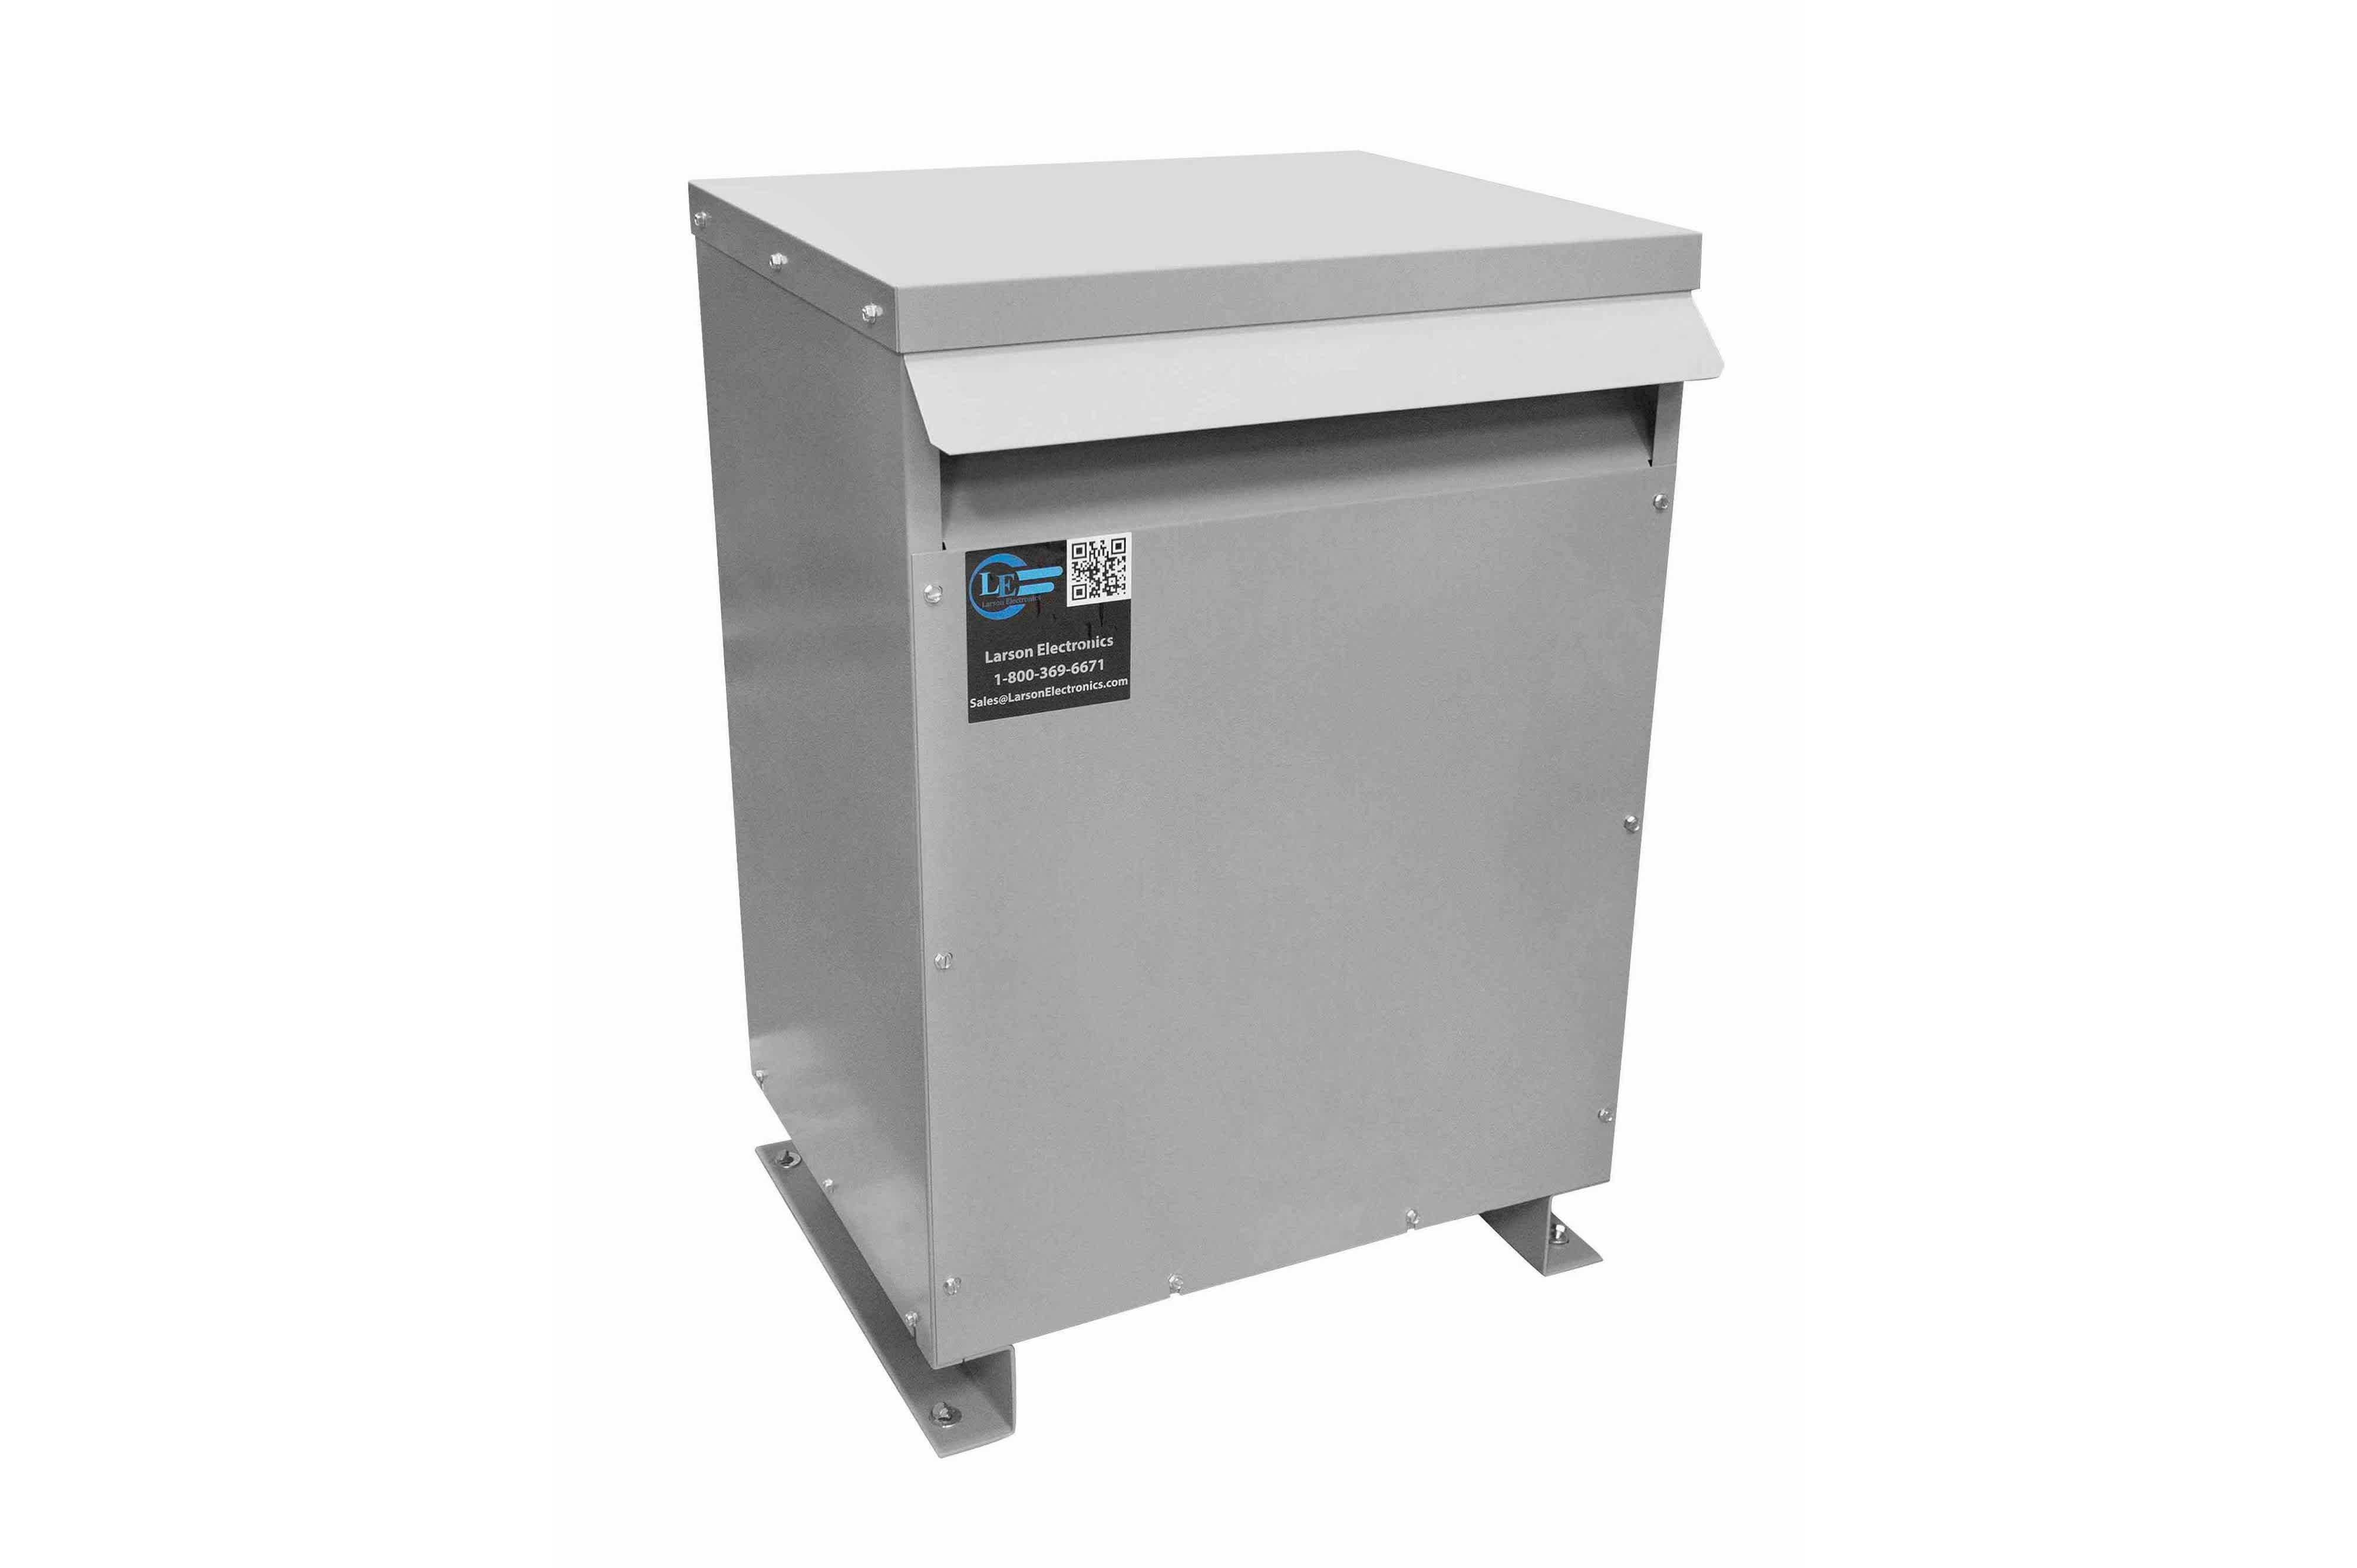 65 kVA 3PH Isolation Transformer, 600V Wye Primary, 380V Delta Secondary, N3R, Ventilated, 60 Hz